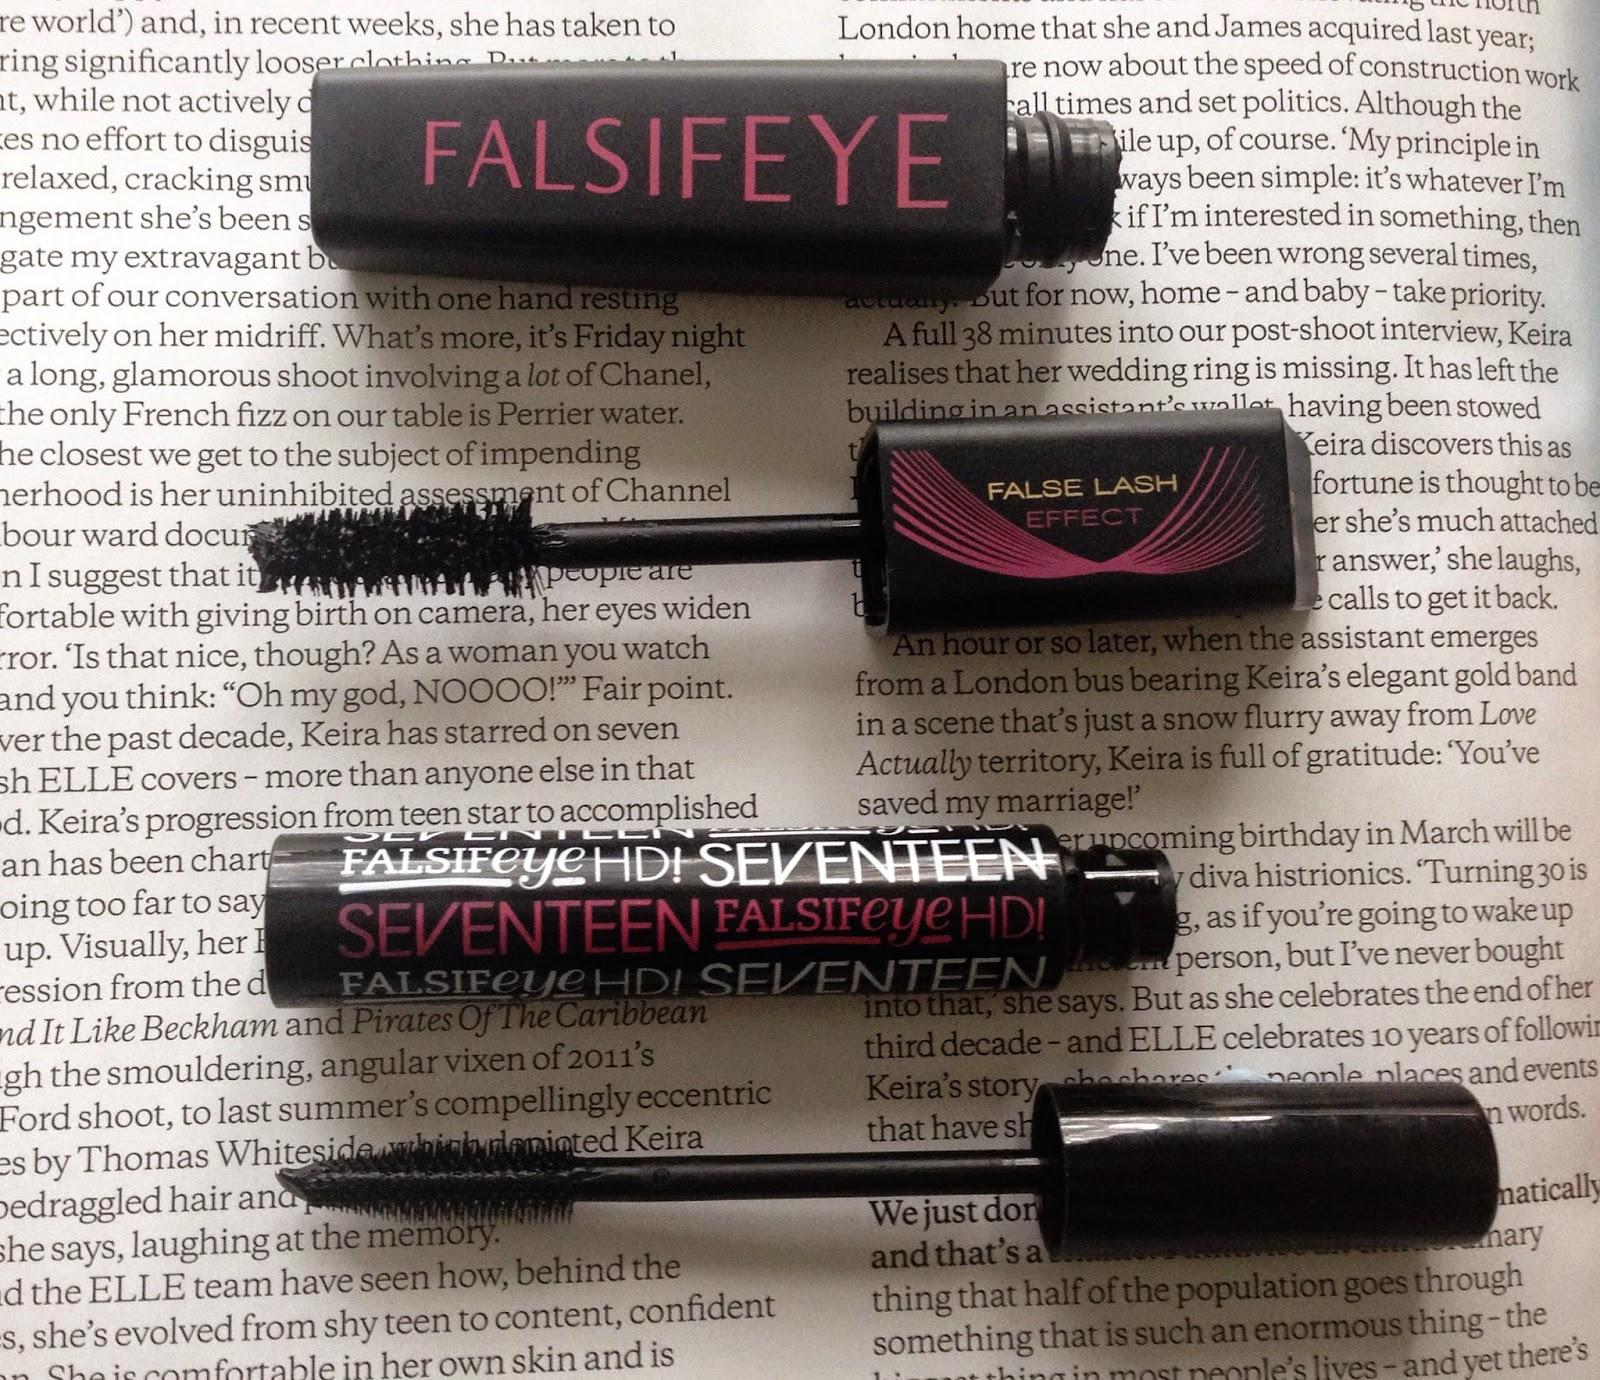 Seventeen Falsifeye Mascara